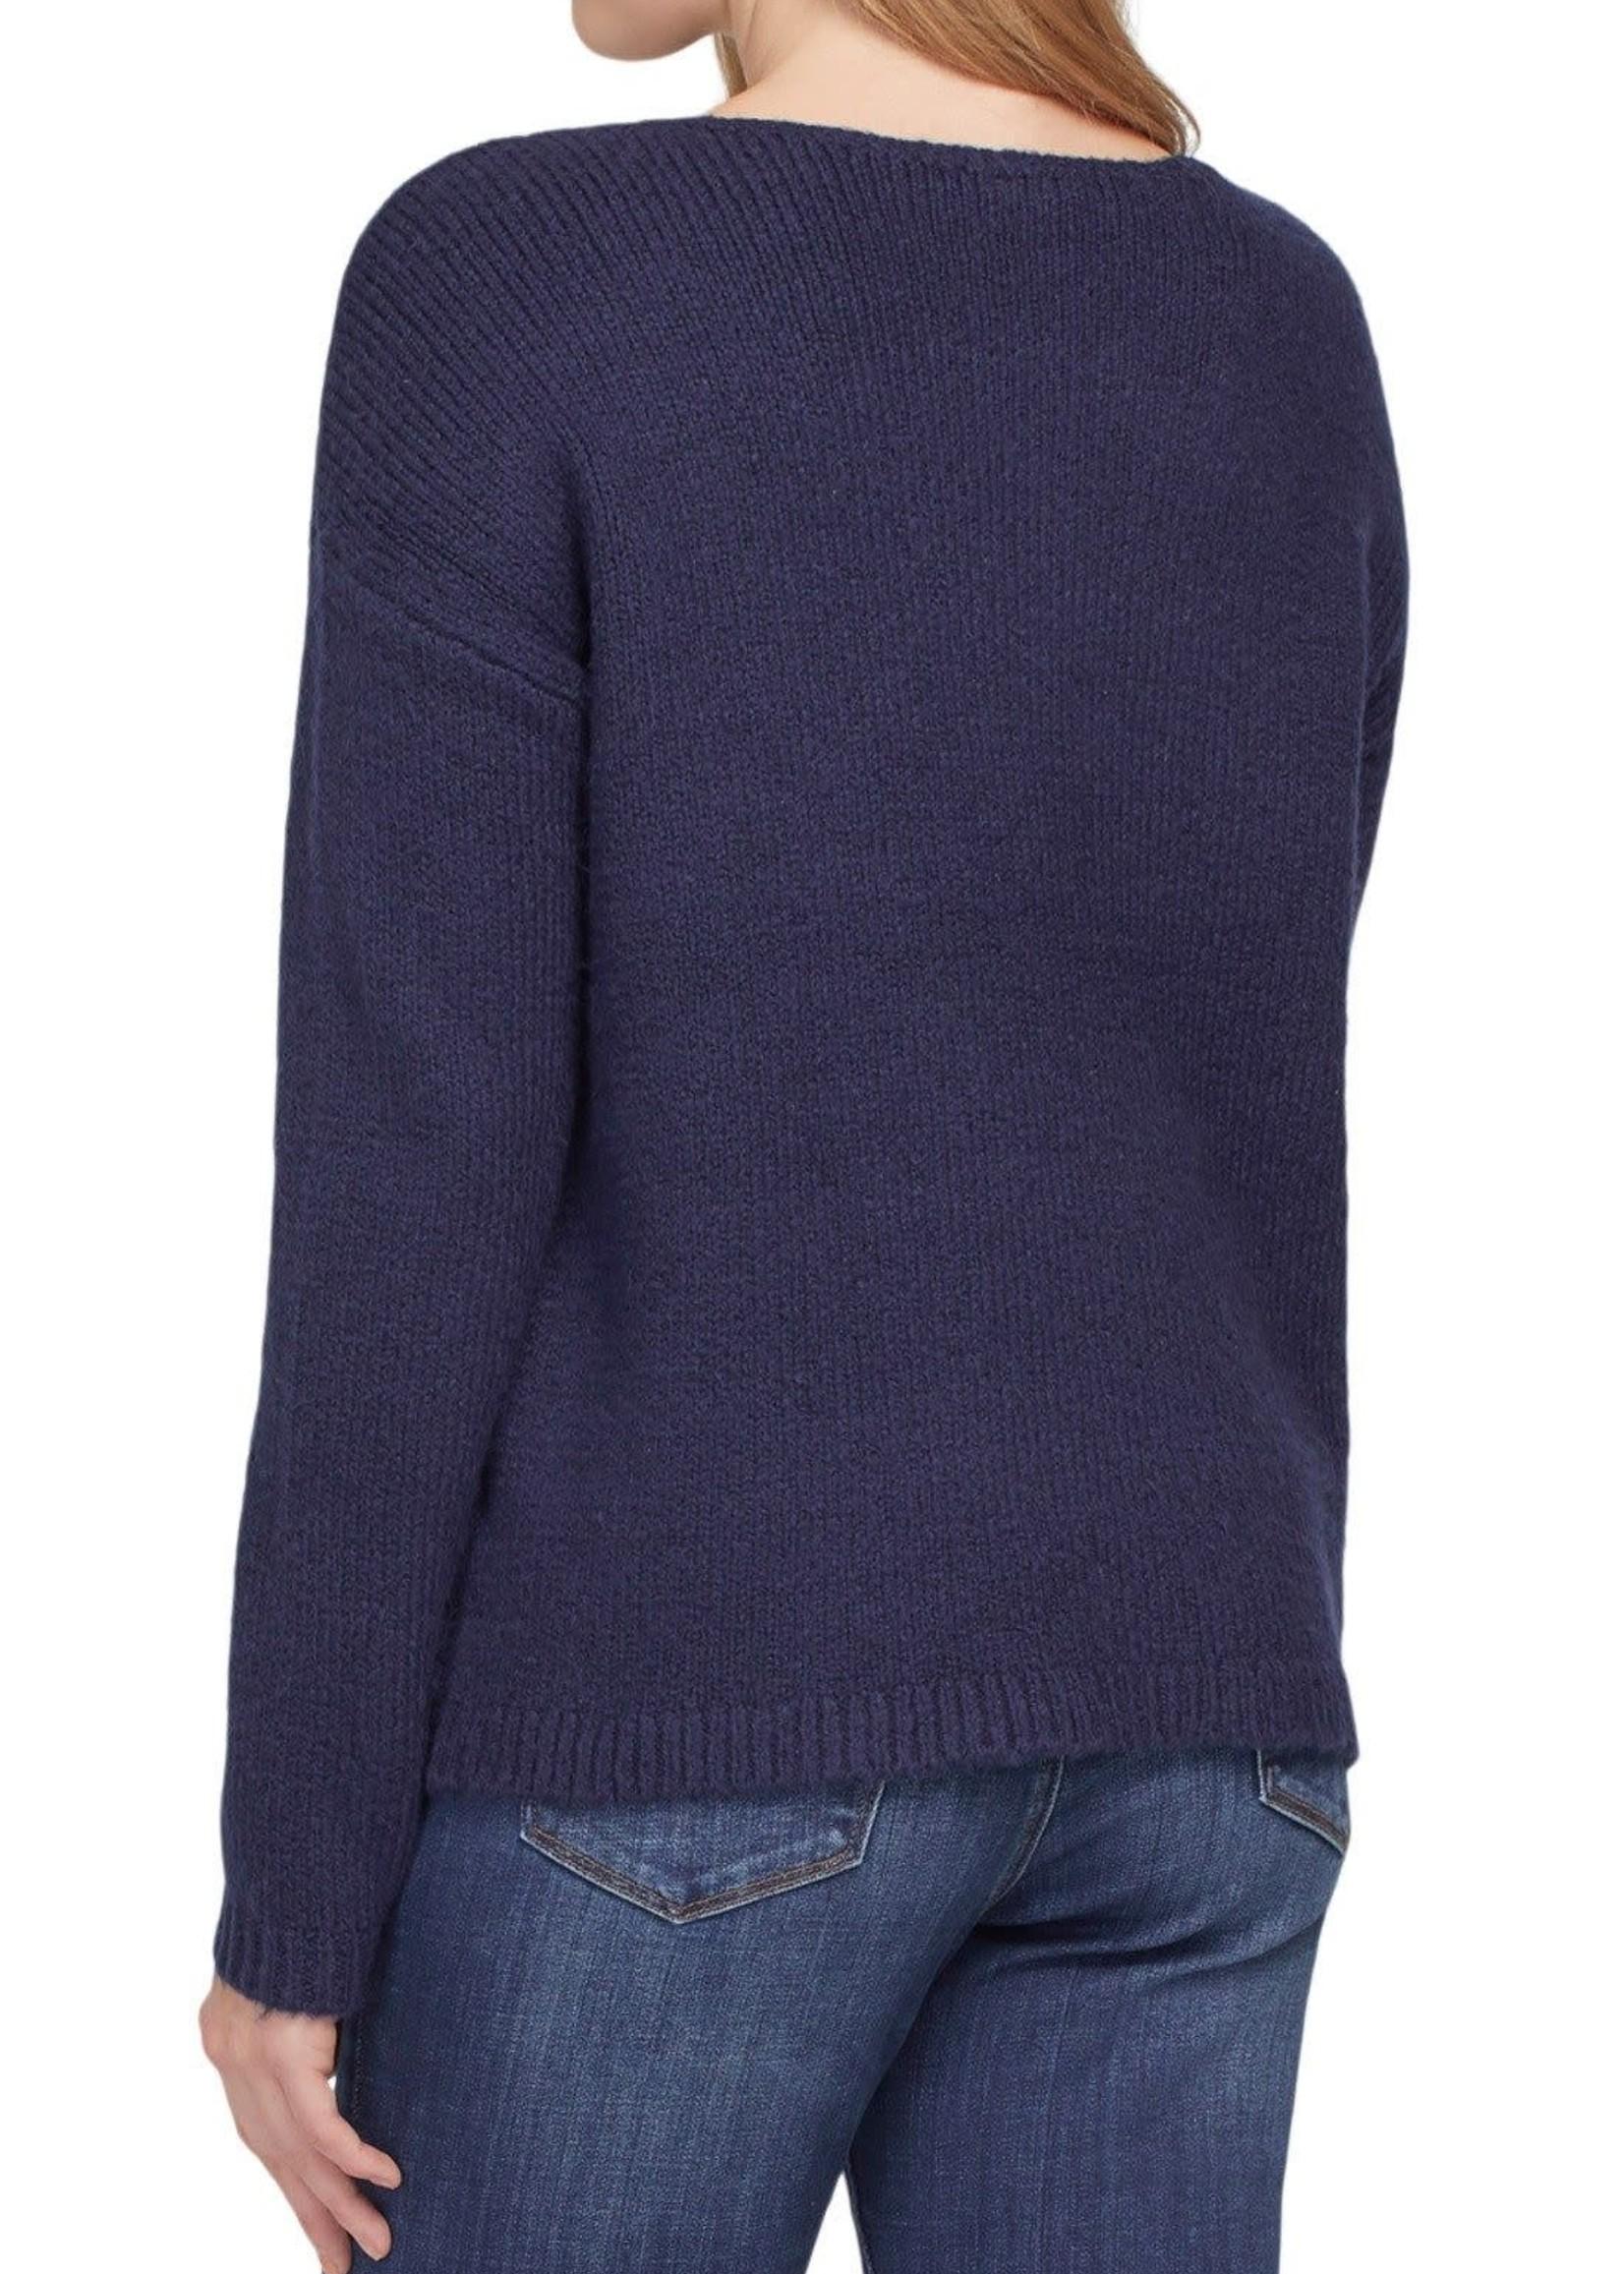 Tribal Tribal L/S Intarsia Sweater Nautical